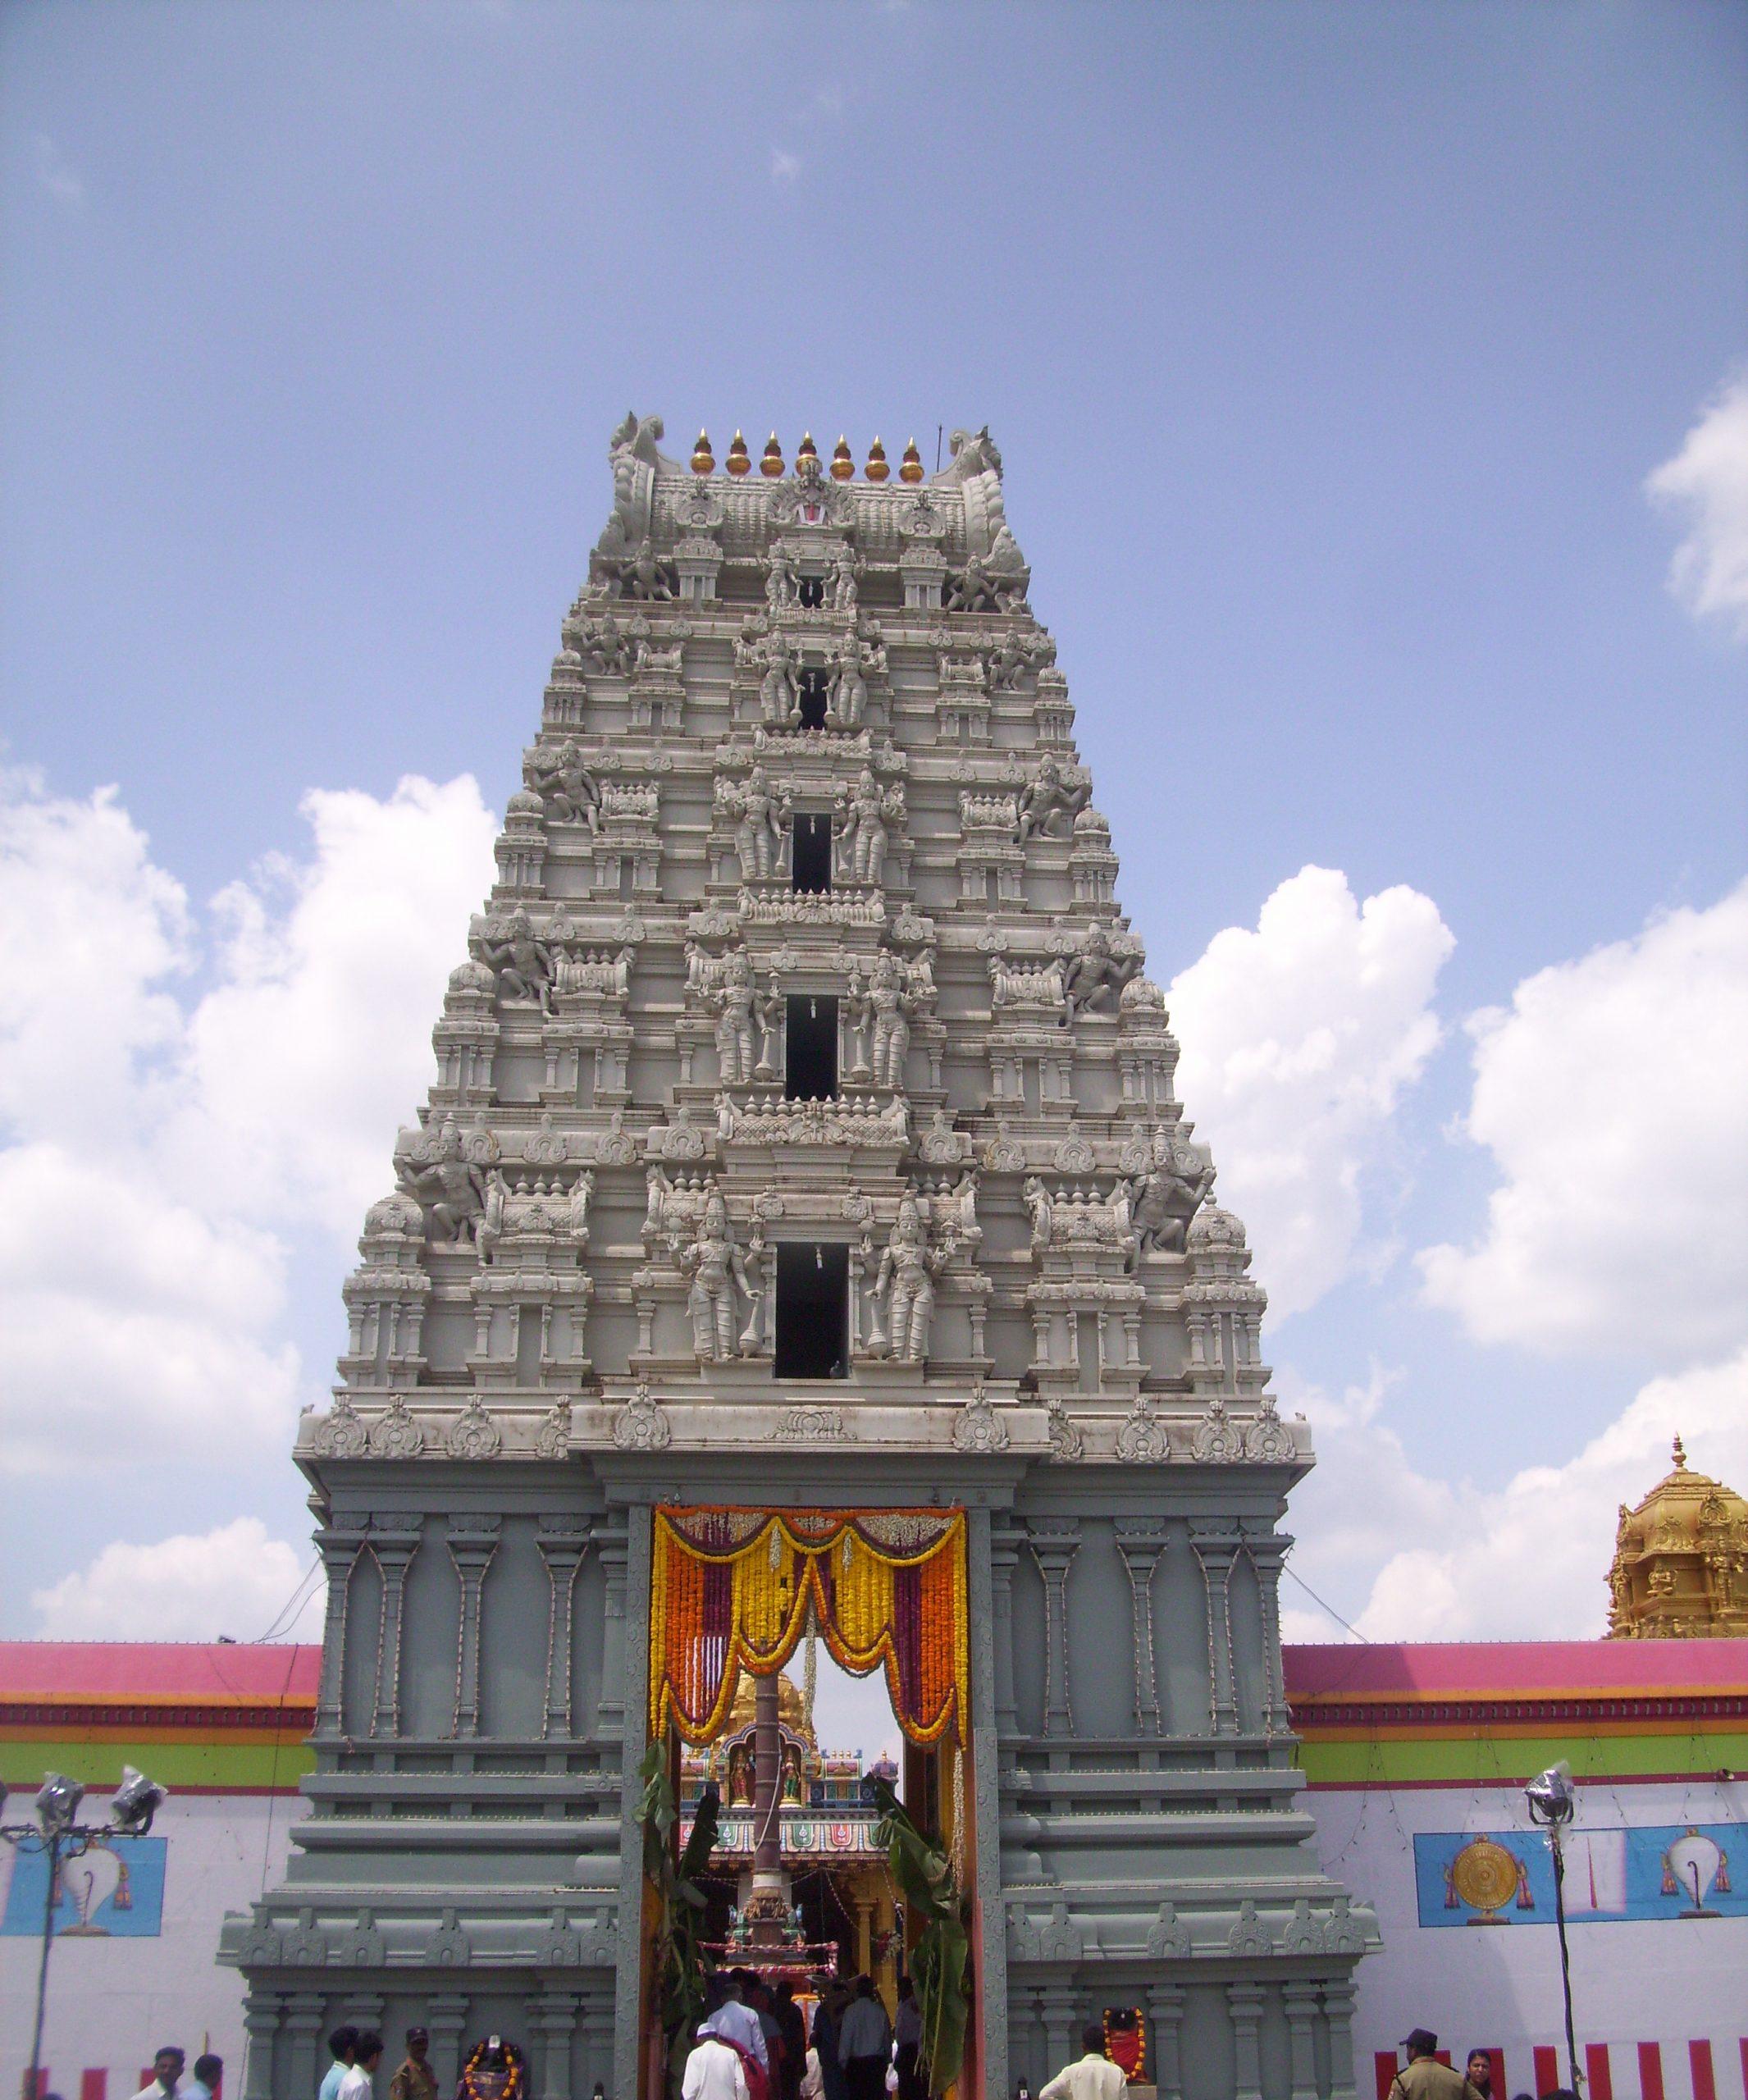 Balaji Temple of Ketkawla-Best Temple to Visit in Pune